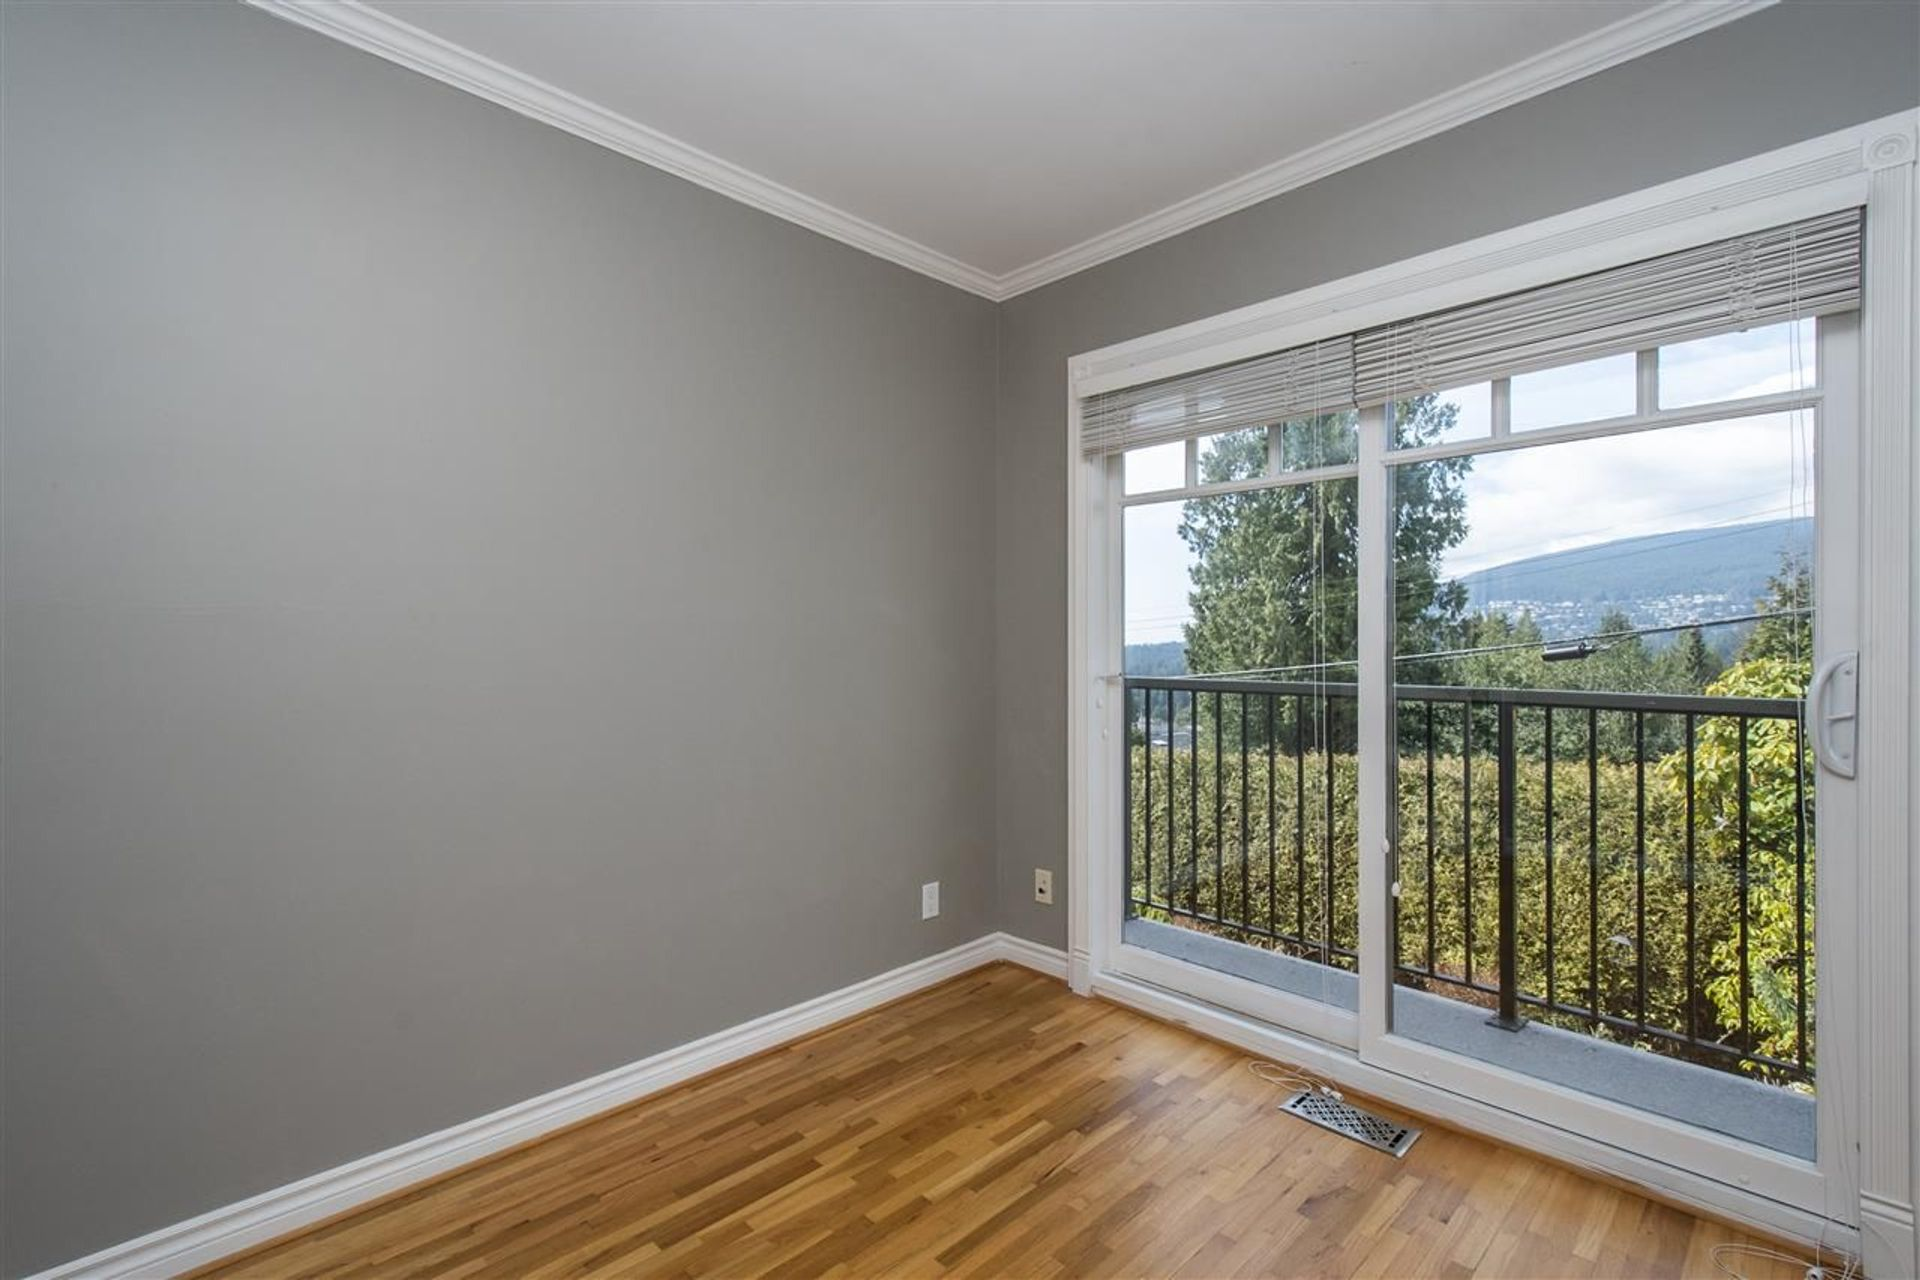 4488-skyline-drive-canyon-heights-nv-north-vancouver-21 at 4488 Skyline Drive, Canyon Heights NV, North Vancouver